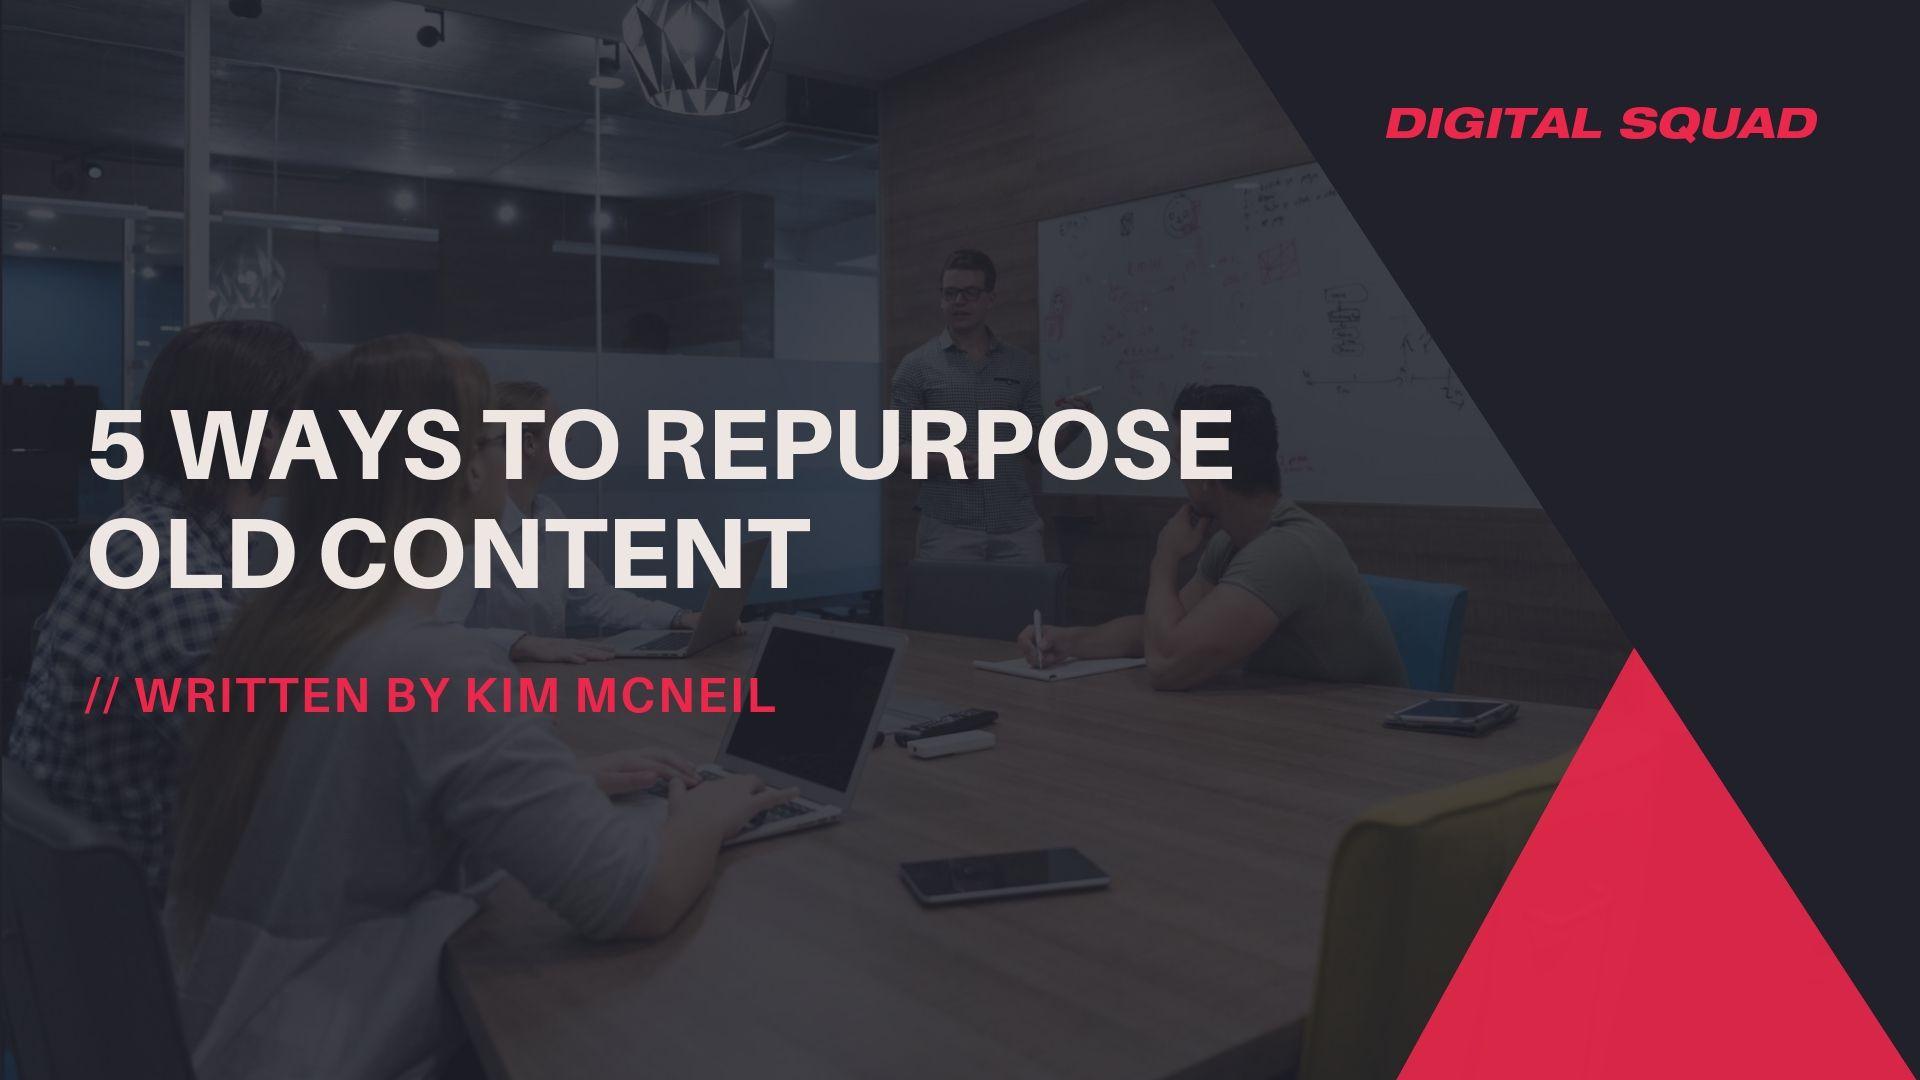 5 Ways to Repurpose Old Content